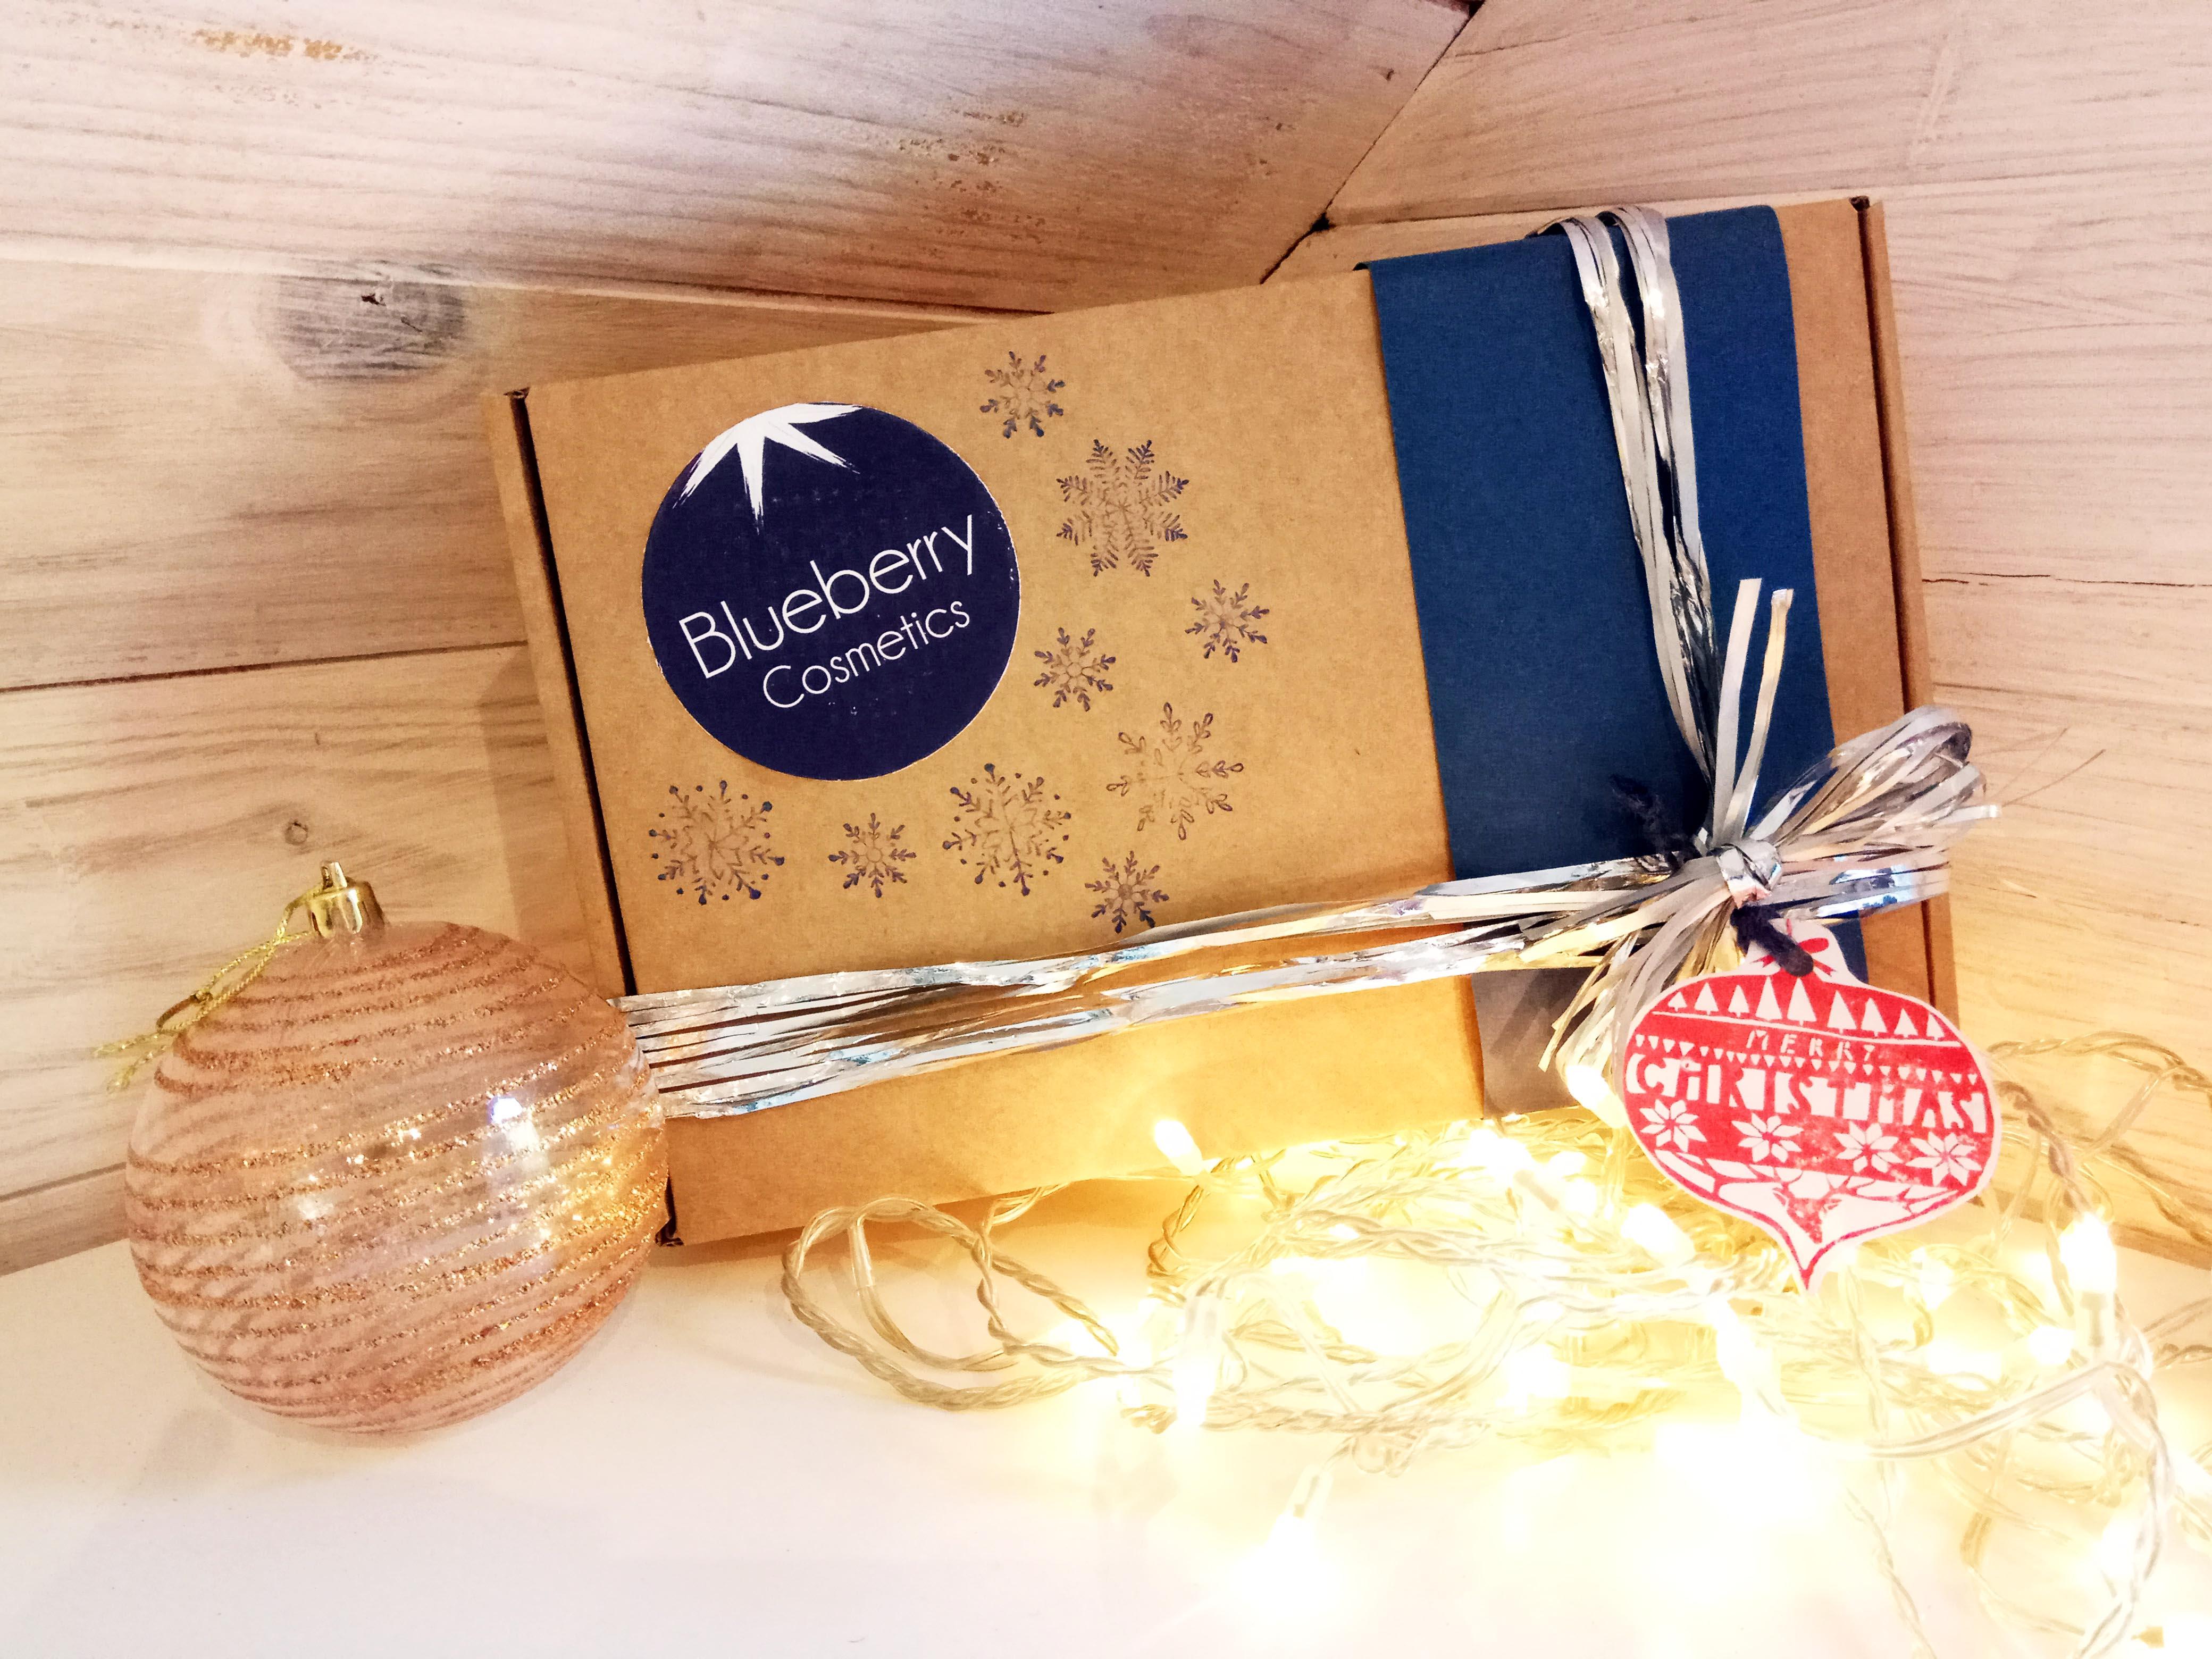 Blueberry Cosmetics Packs de regalo de Navidad